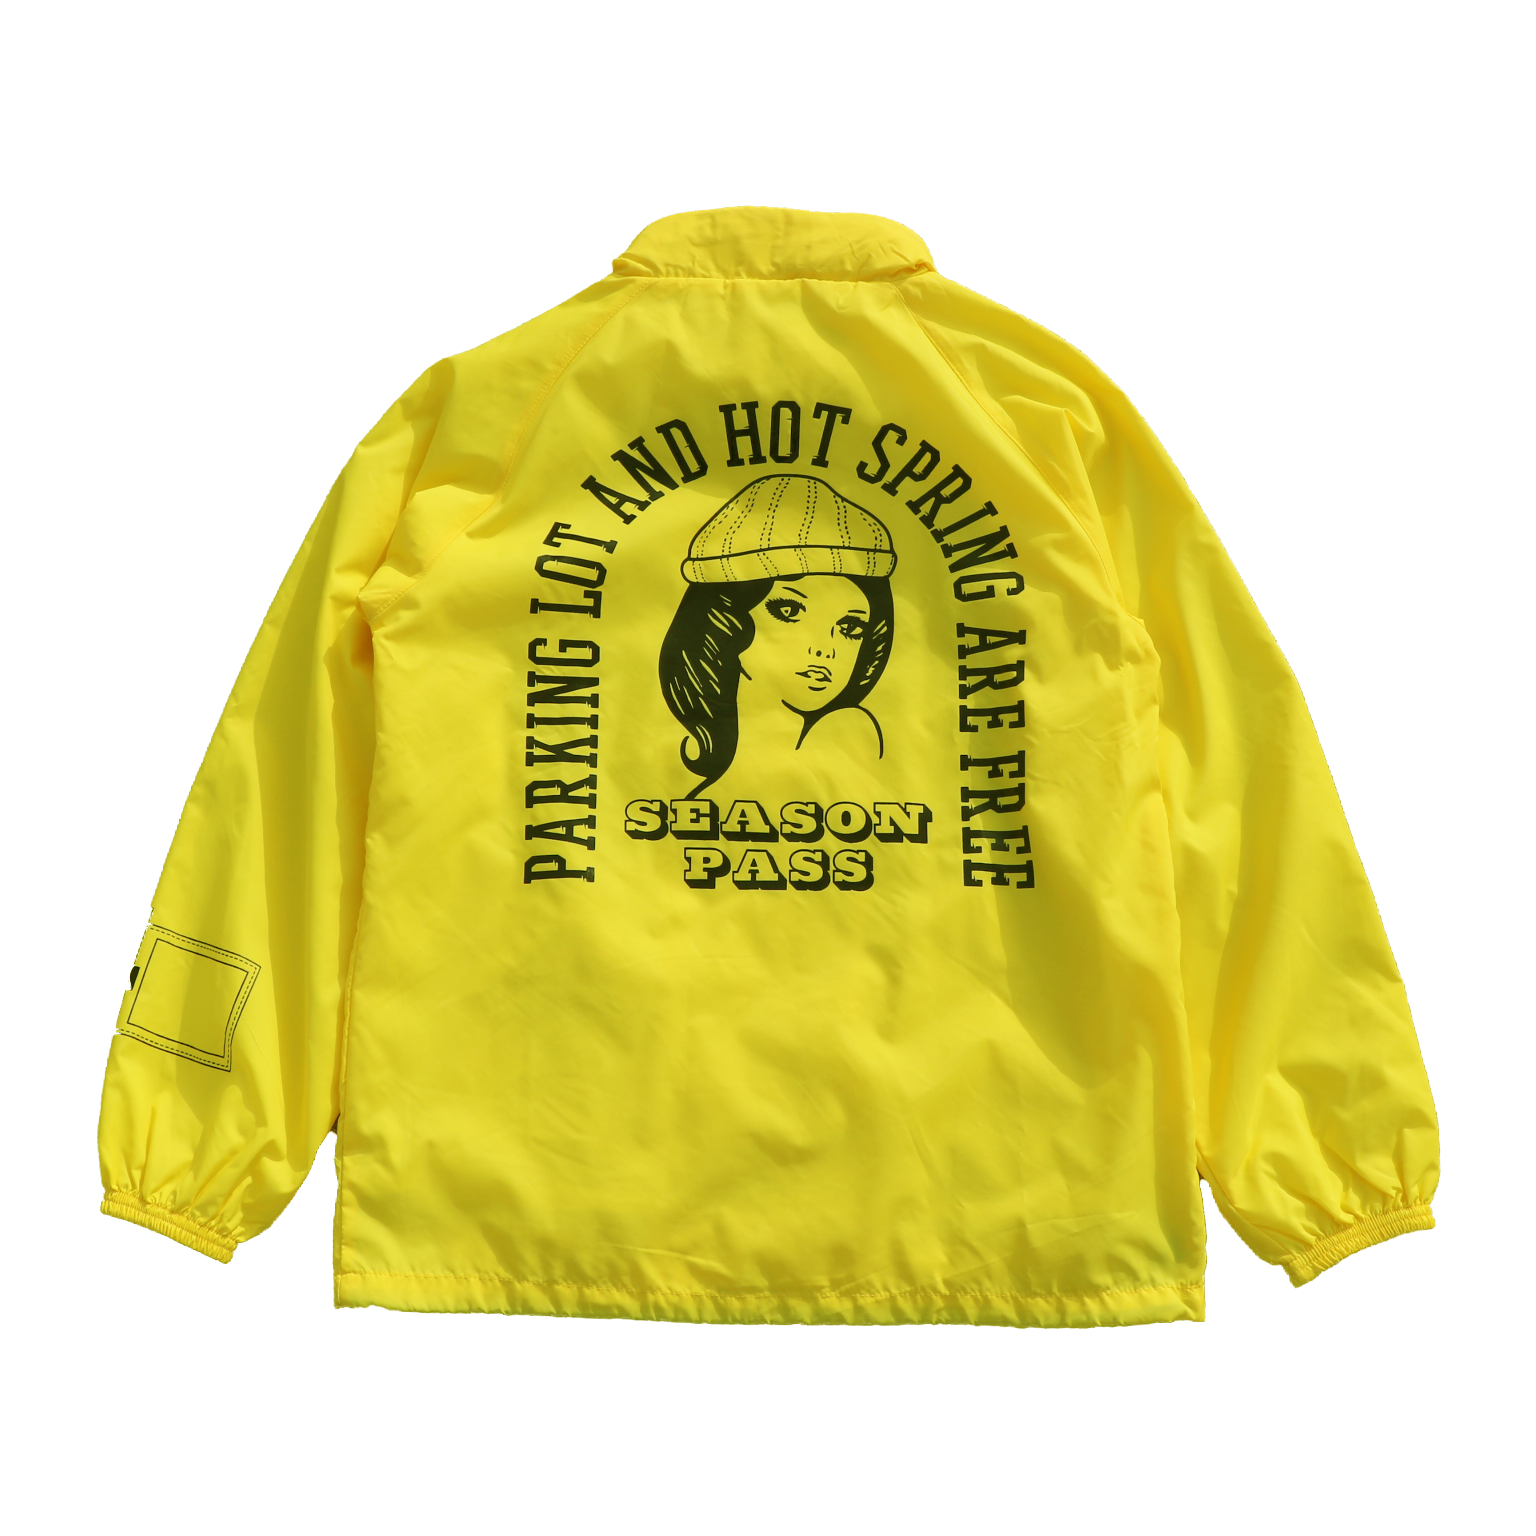 season pass jkt (yellow)